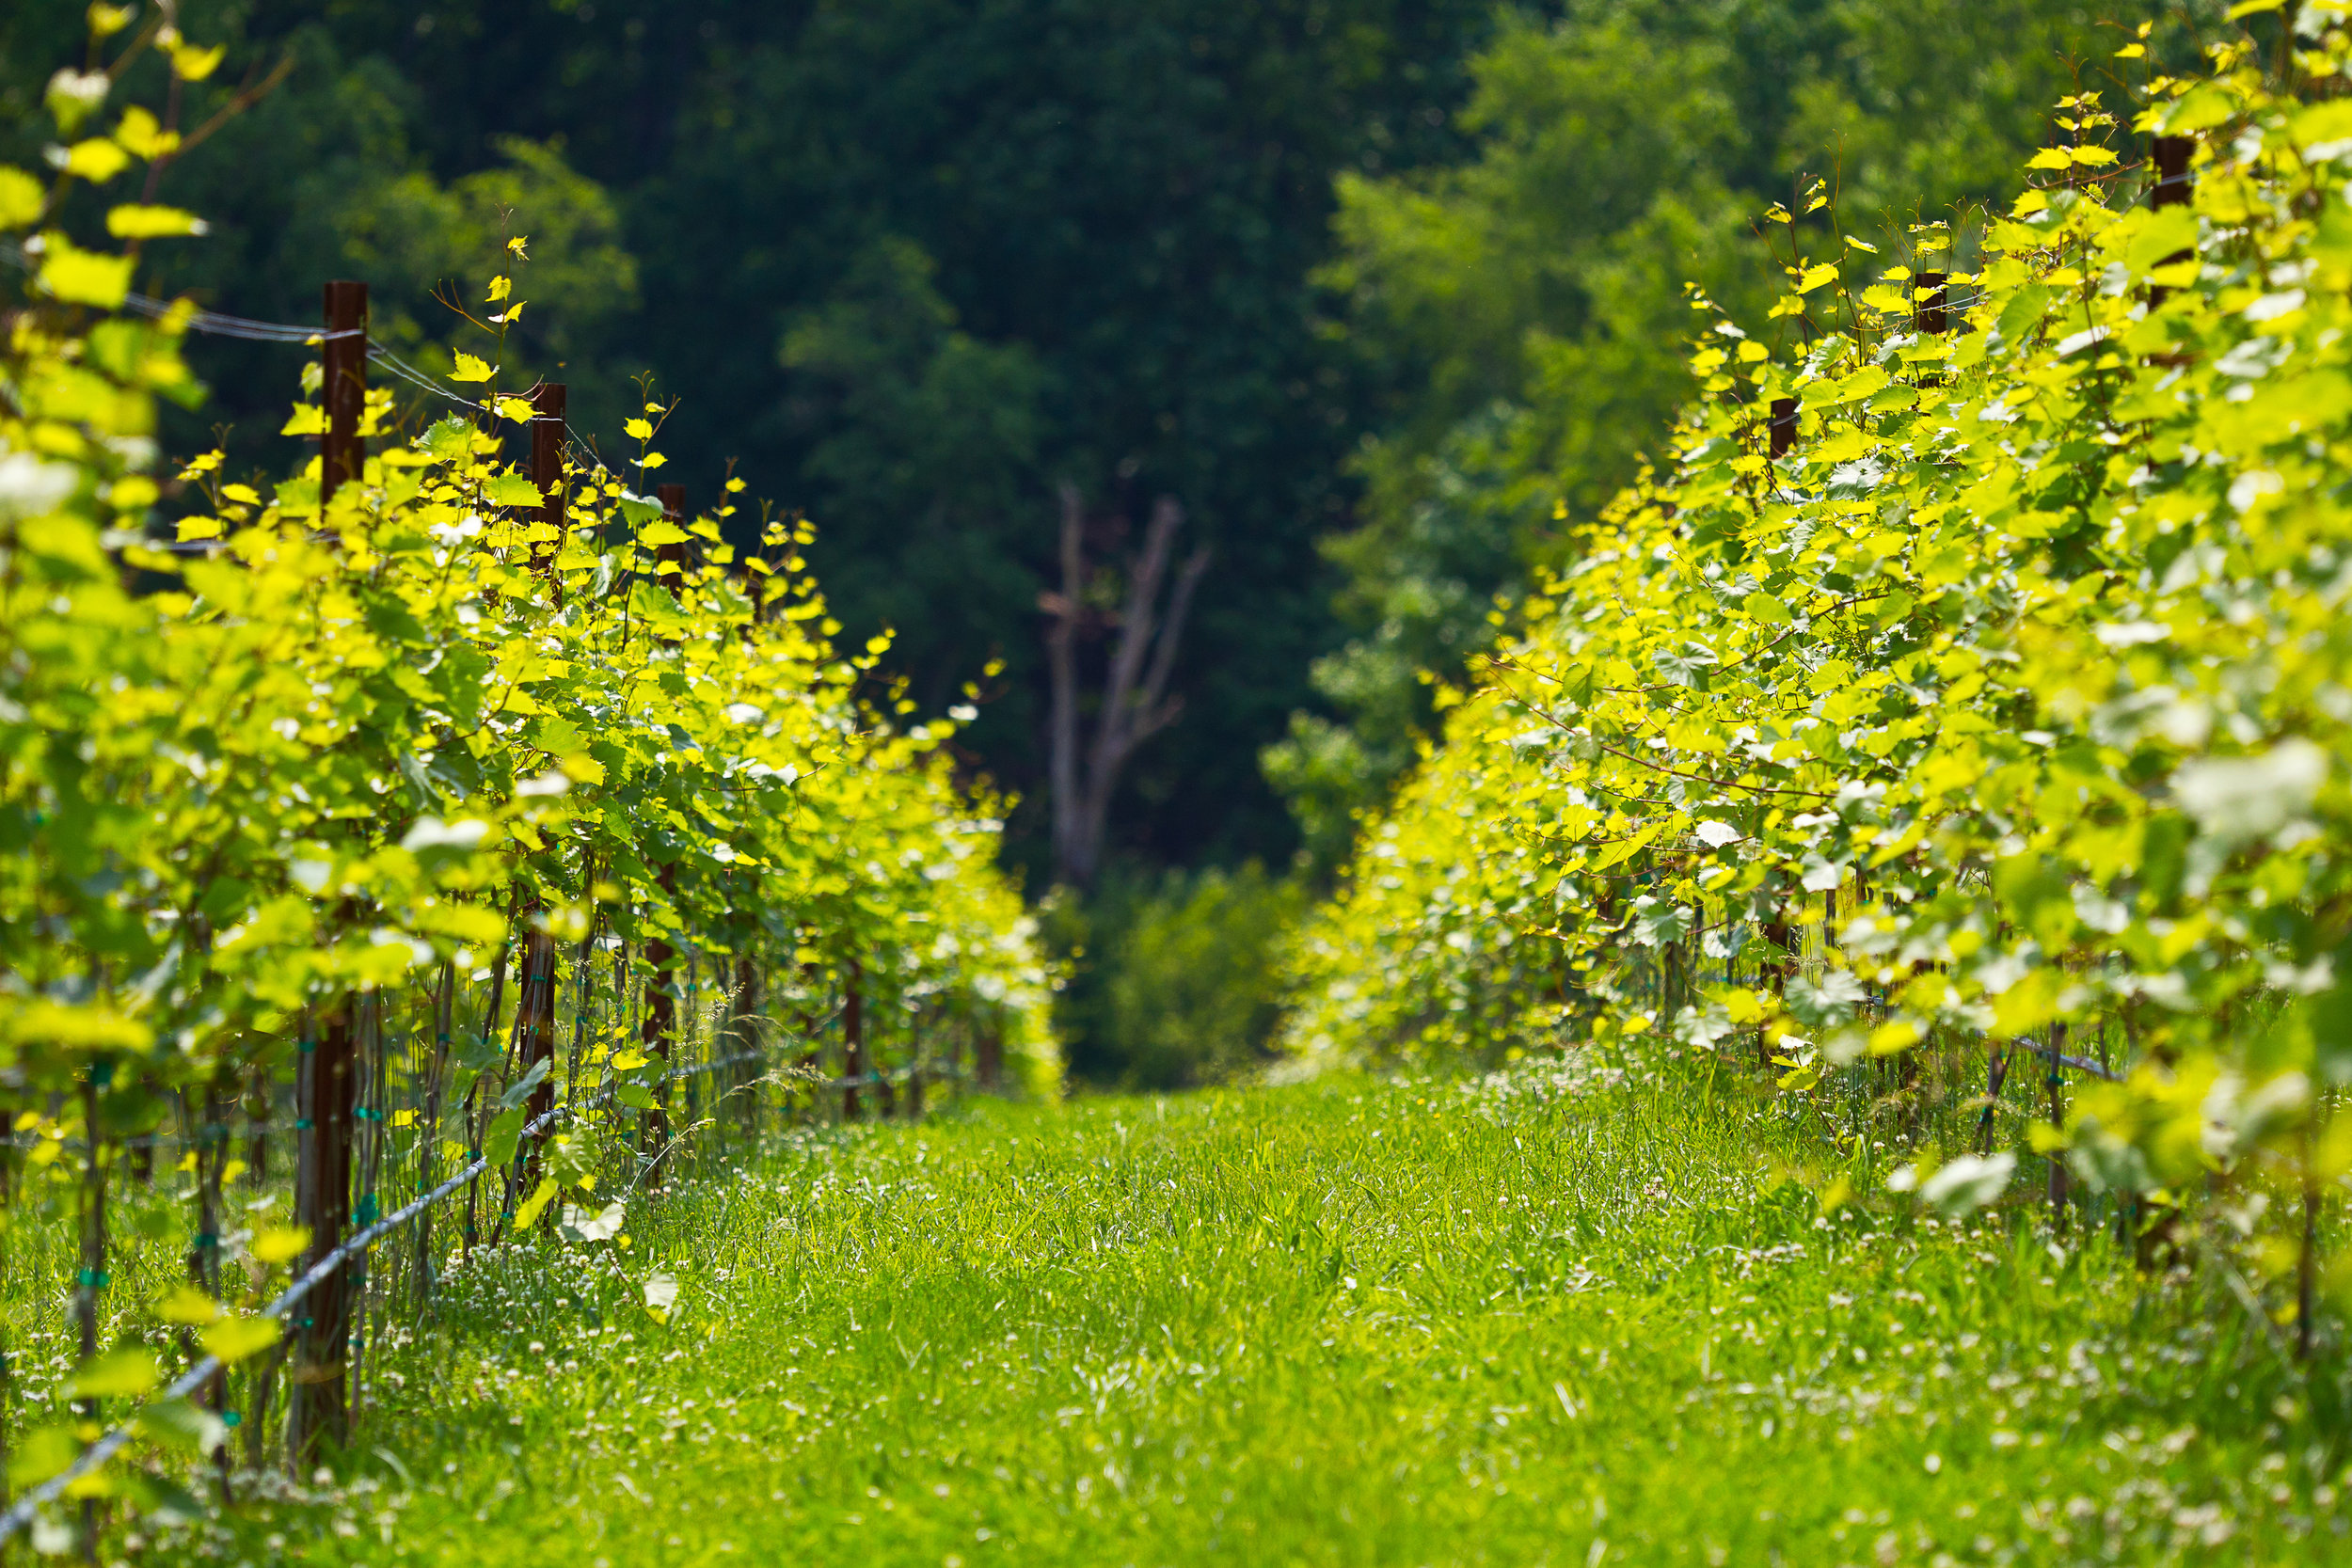 SOUTH - Features New Favorites: Thatch Winery, Blenheim Vineyards, Trump Vineyards, Keswick Vineyards